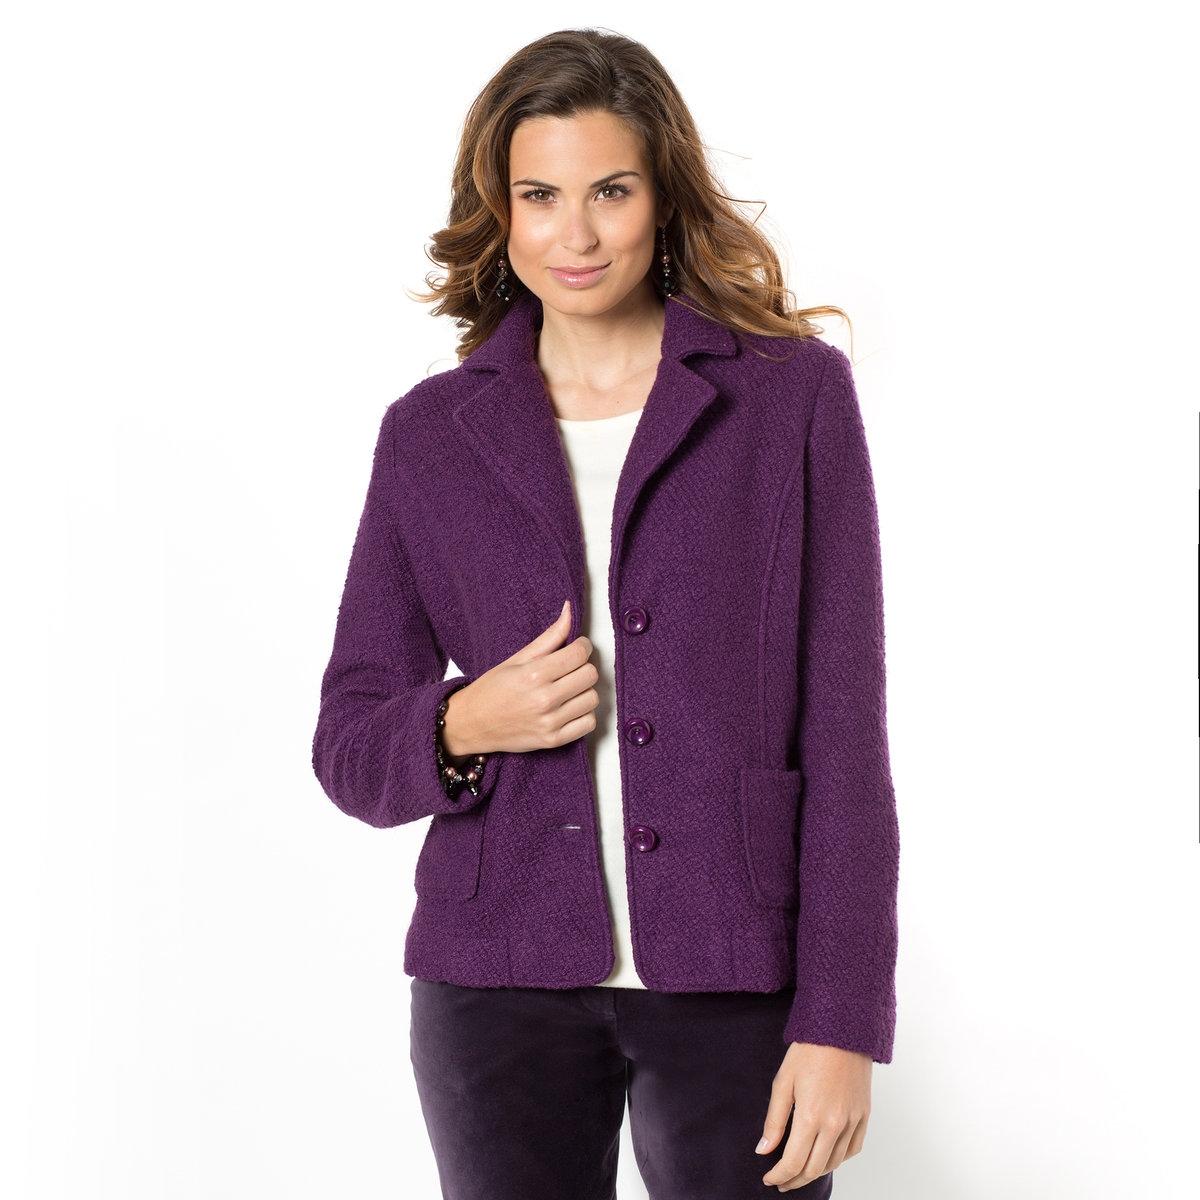 Жакет, 26% шерсти<br><br>Цвет: фиолетовый<br>Размер: 40 (FR) - 46 (RUS).50 (FR) - 56 (RUS)